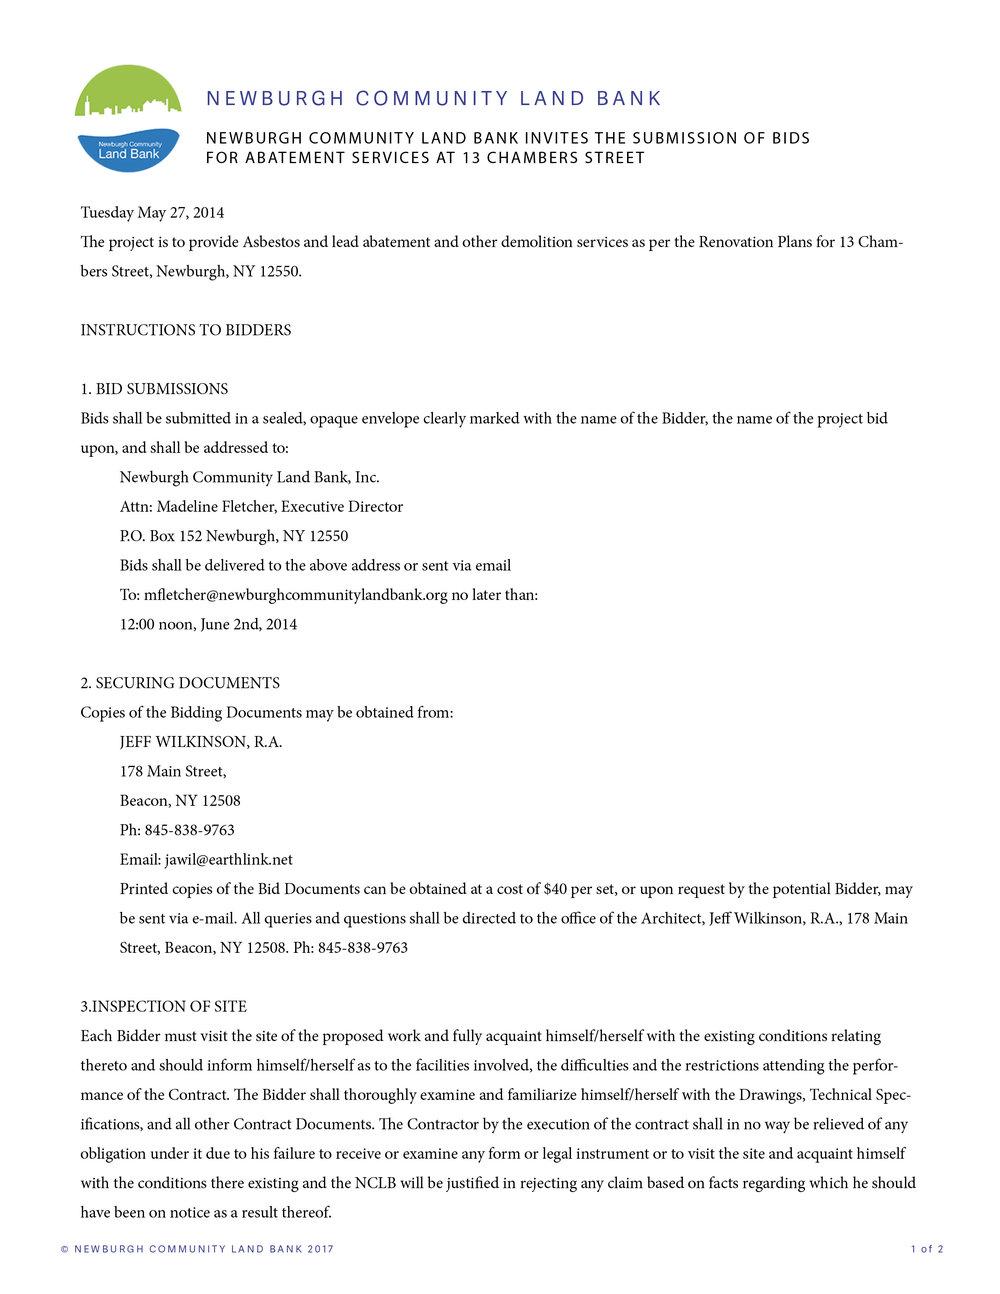 NCLB RFP 13 Chambers Abatement.jpg